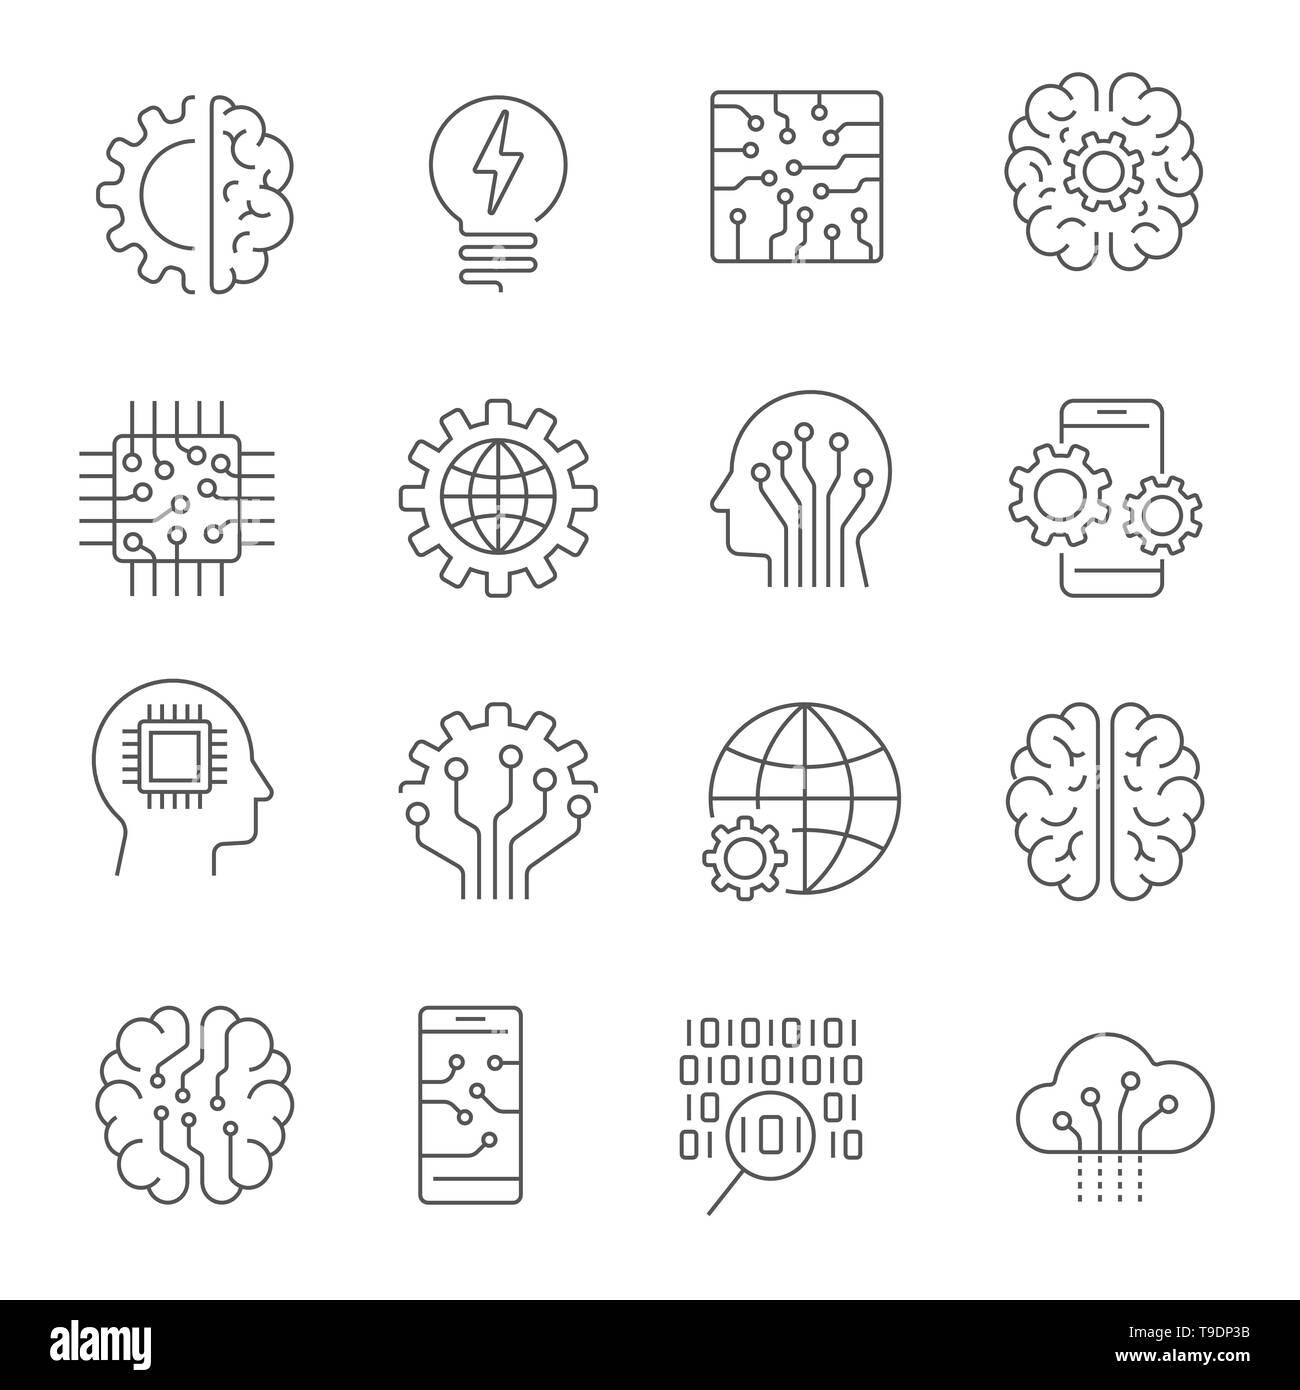 Artificial intelligence icon set. Editable Stroke - Stock Image